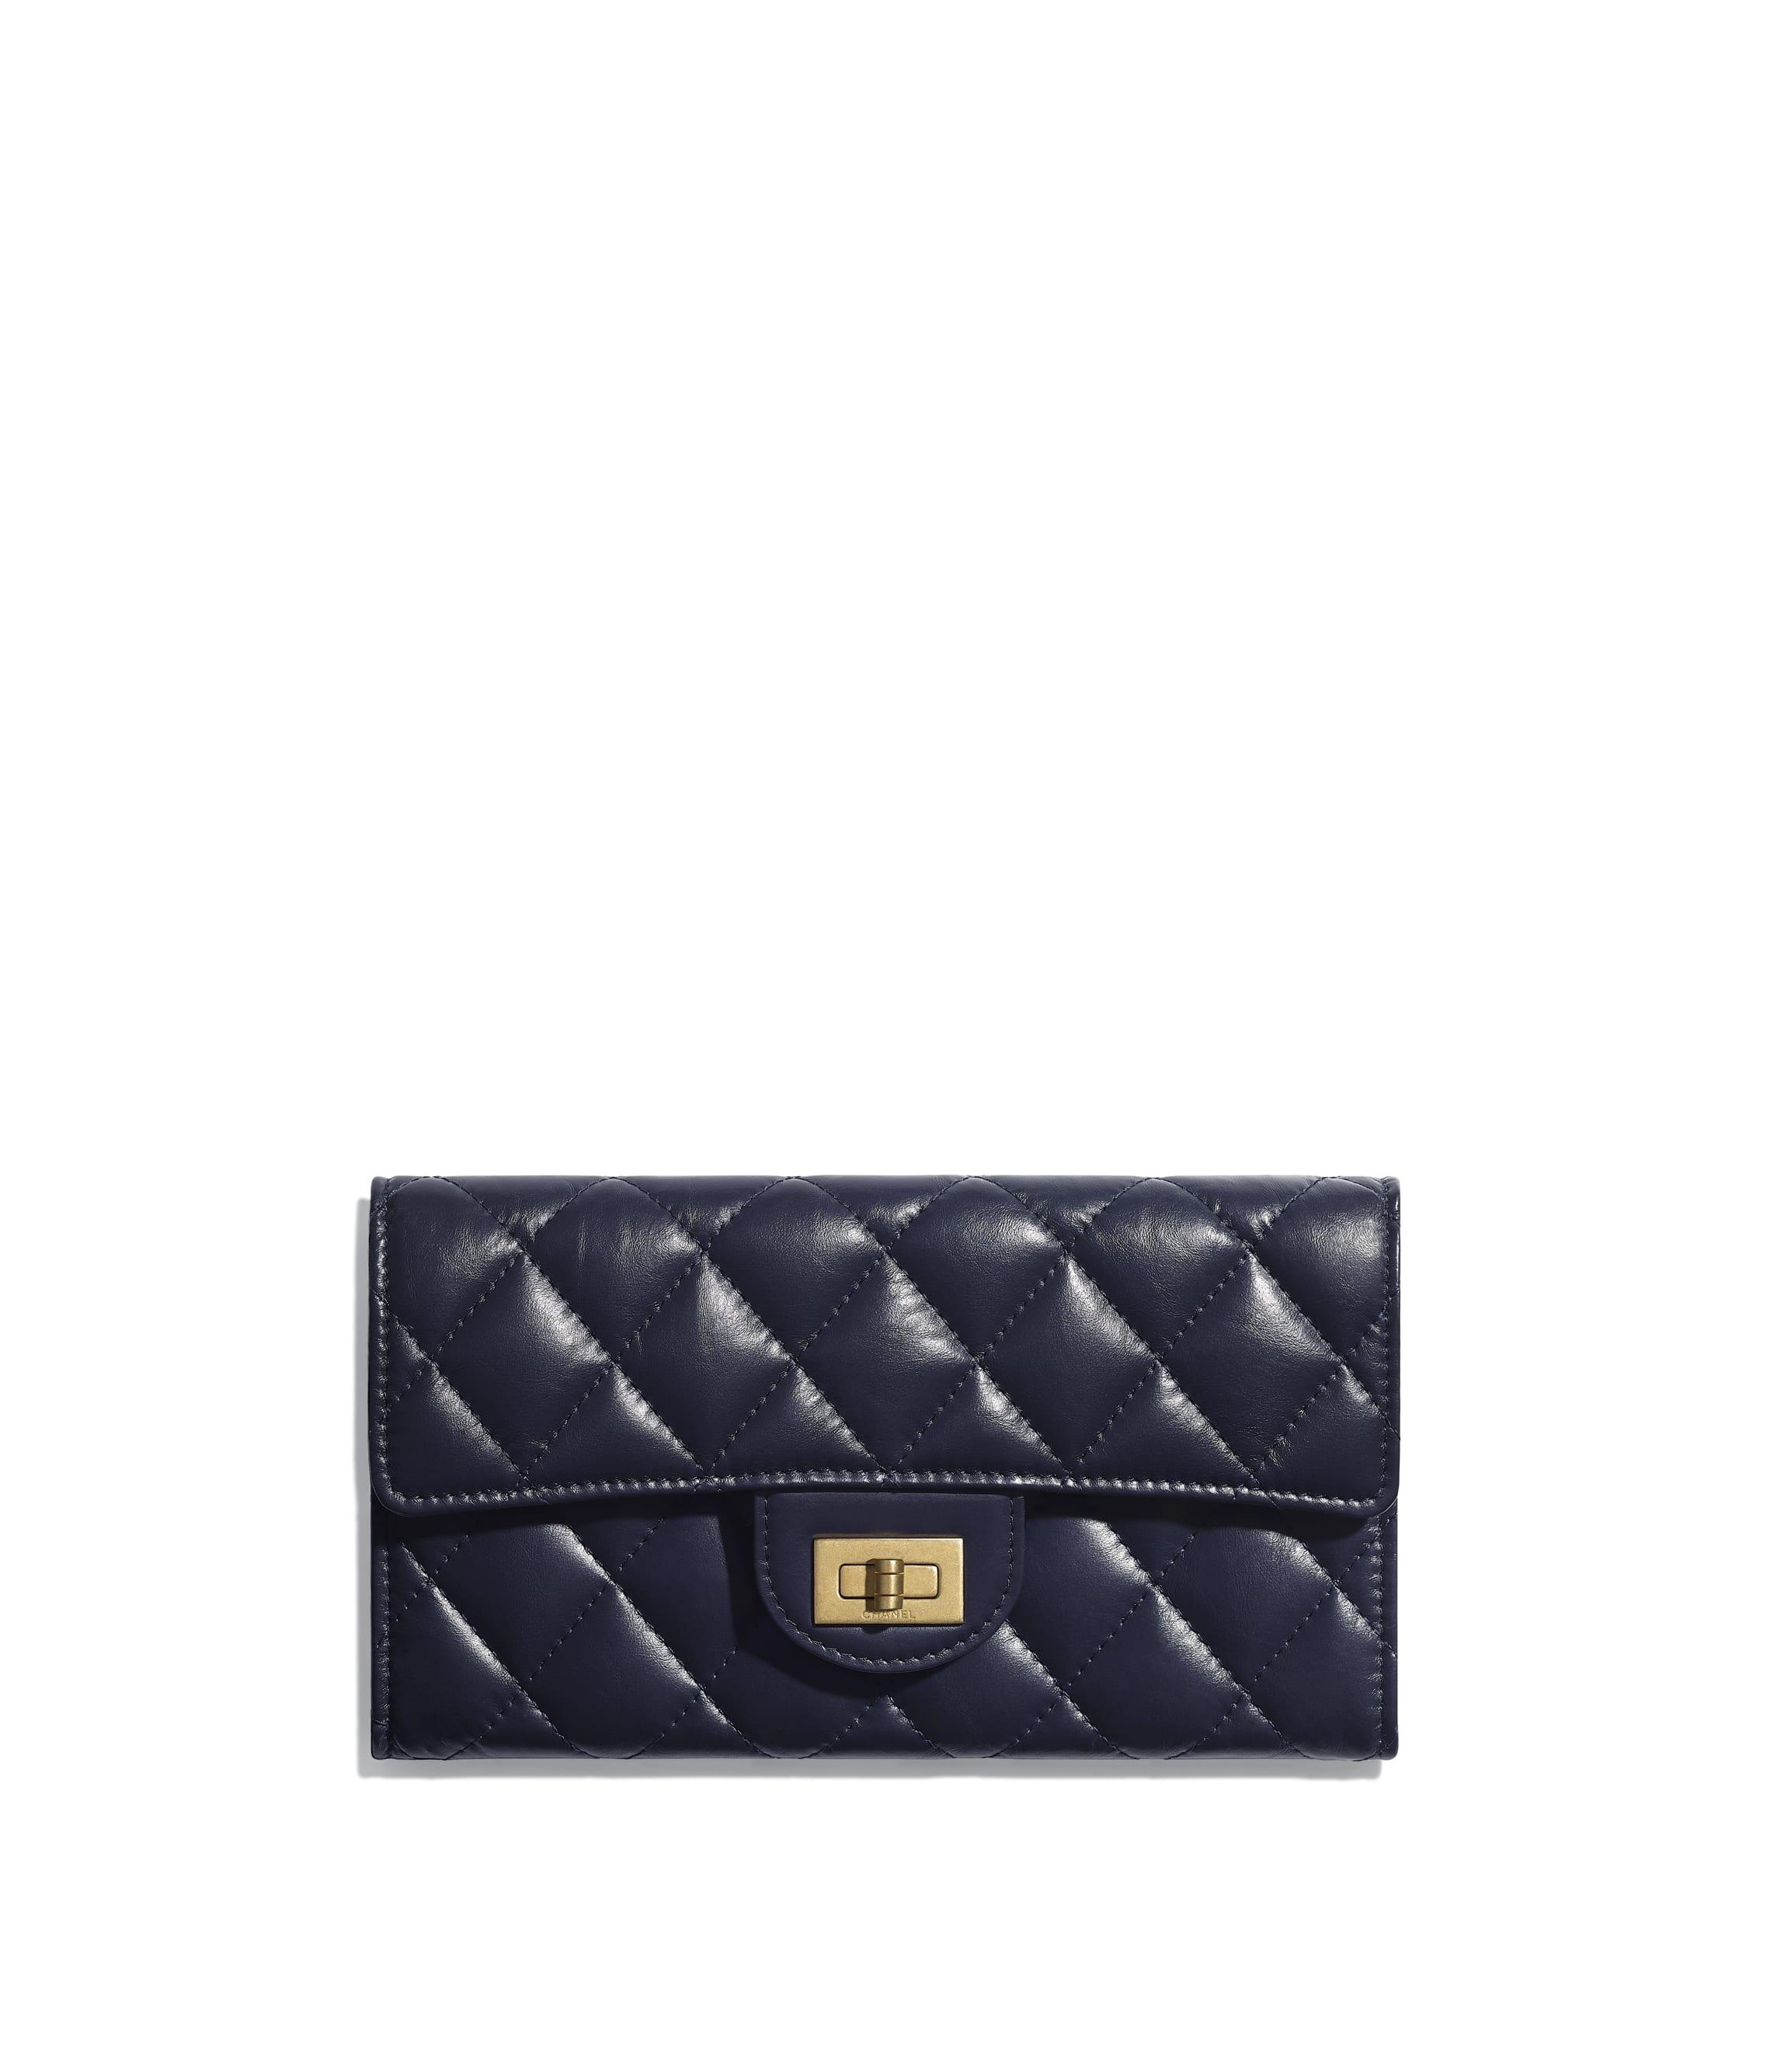 2.55 Flap Wallet